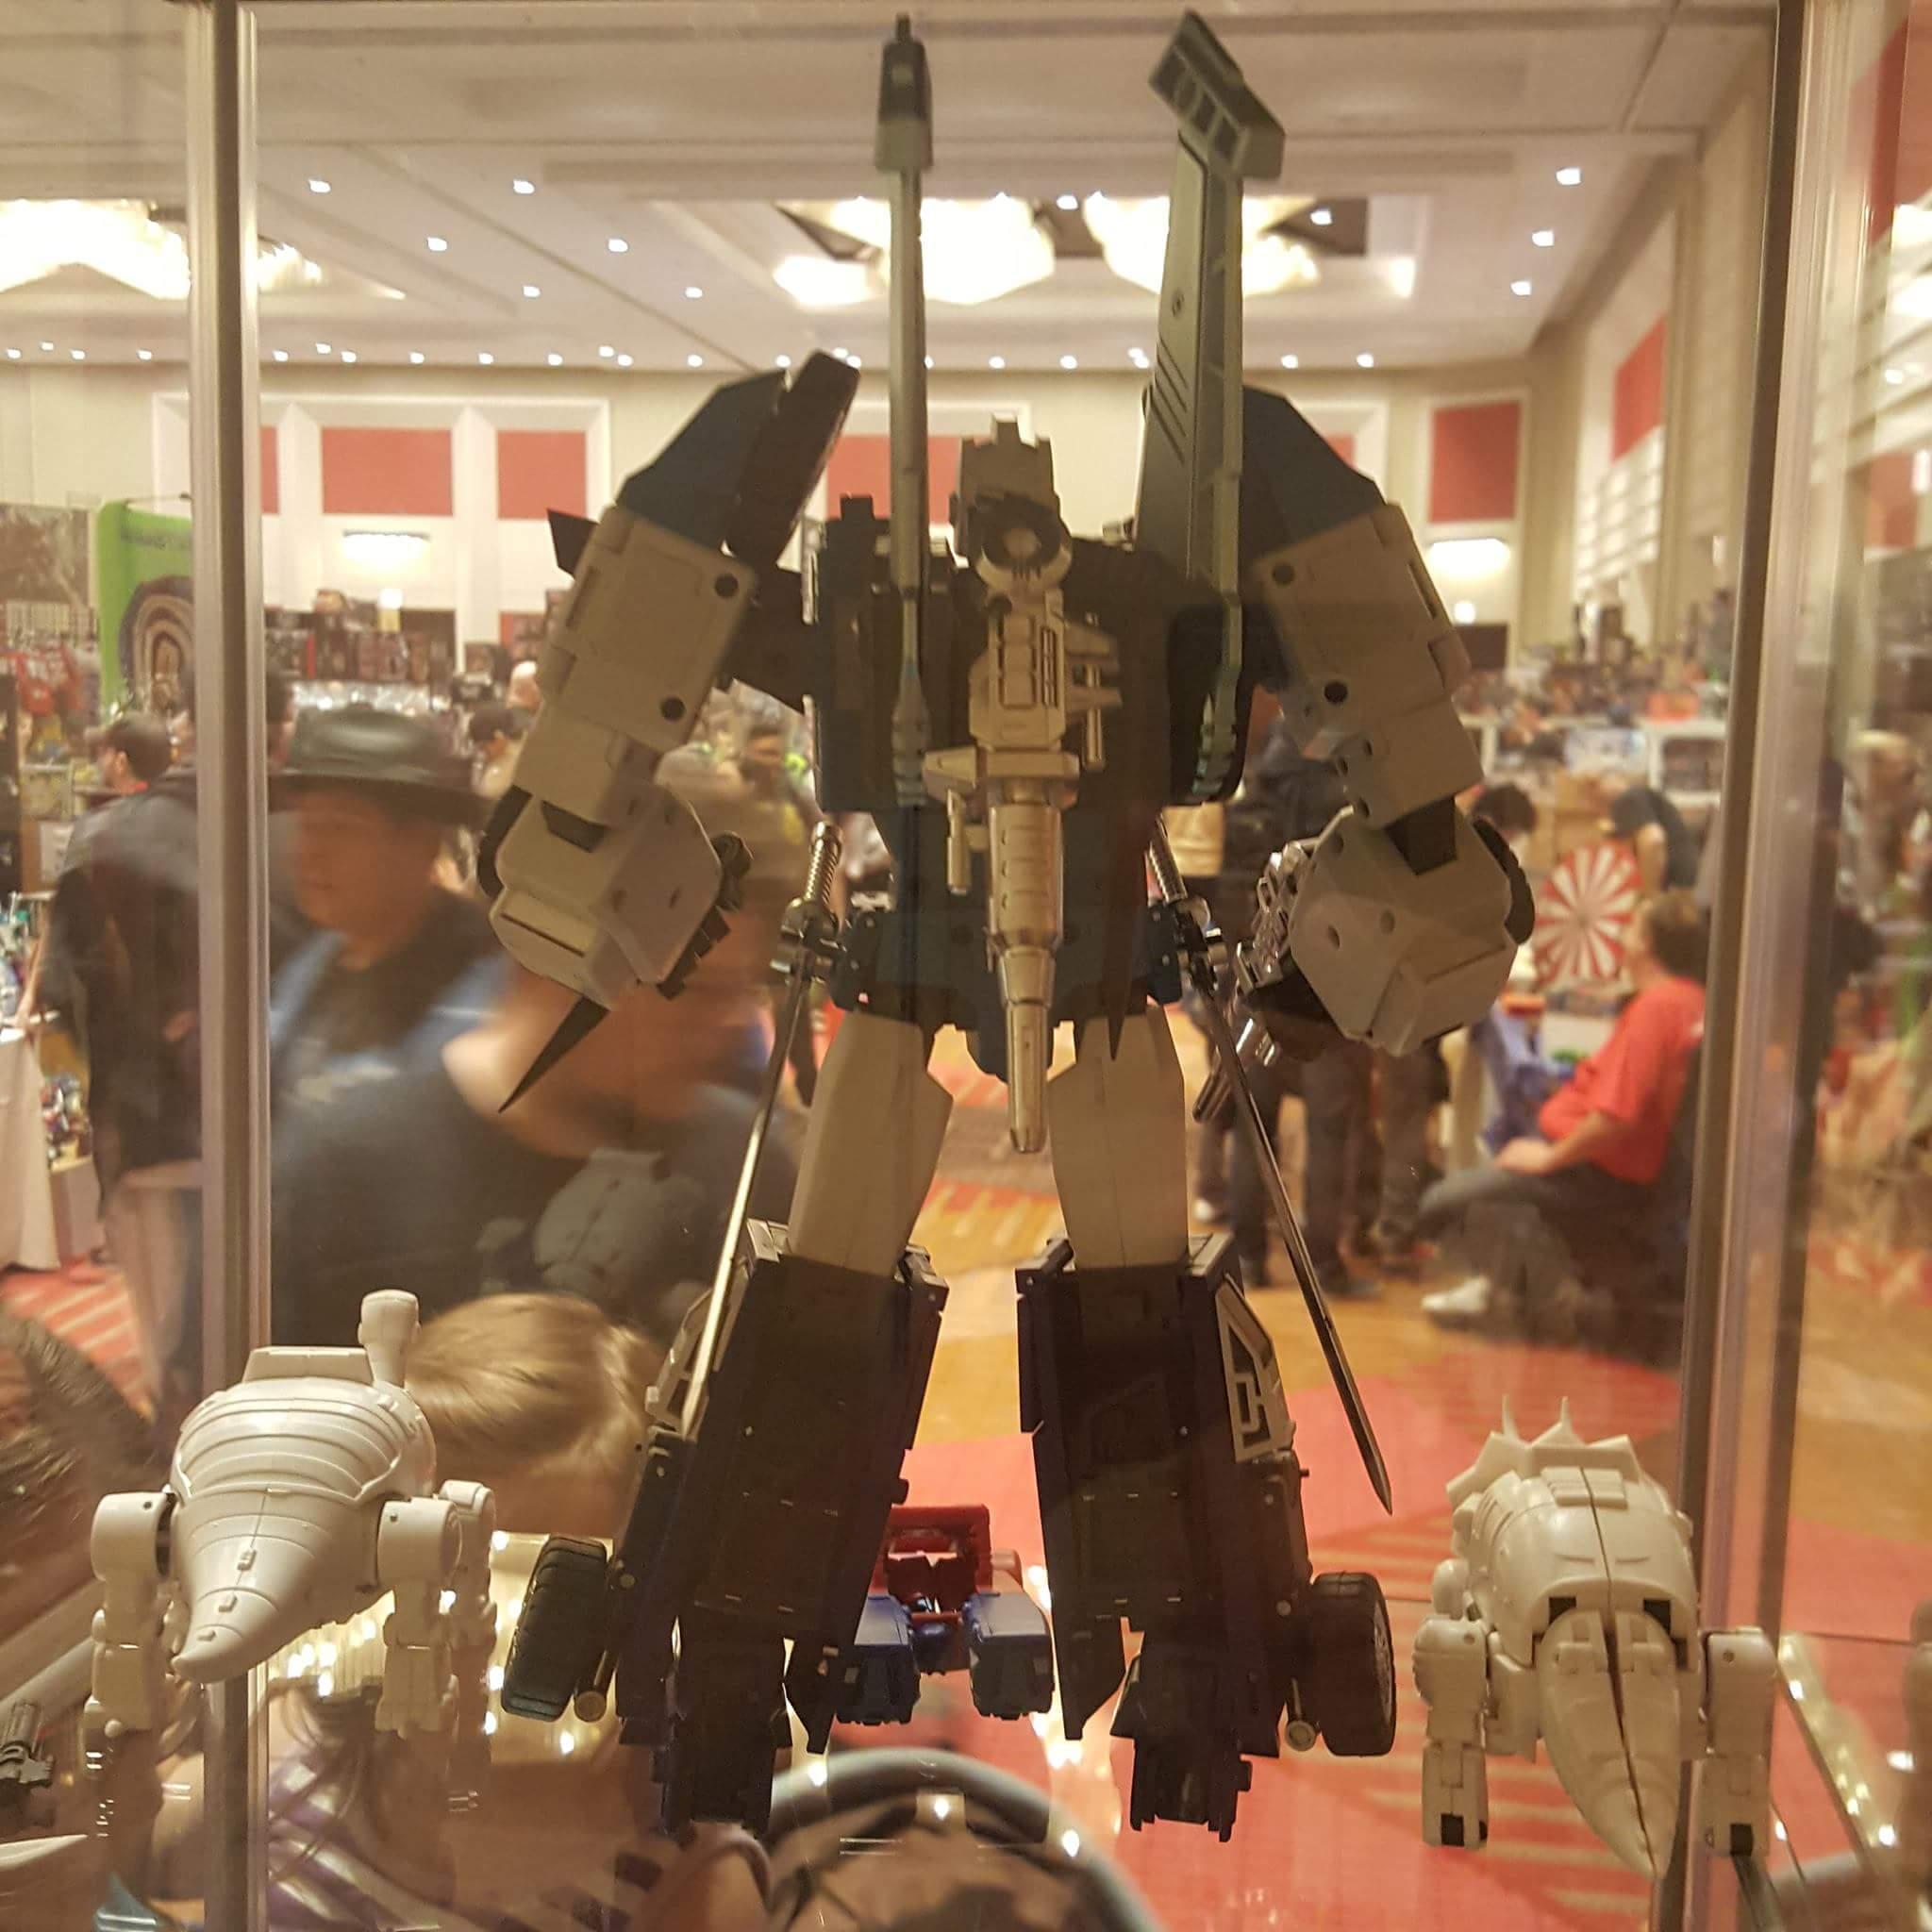 [DX9 Toys] Produit Tiers - Jouet D10 Hanzo - aka Sixshot/Hexabot PWTzaR80